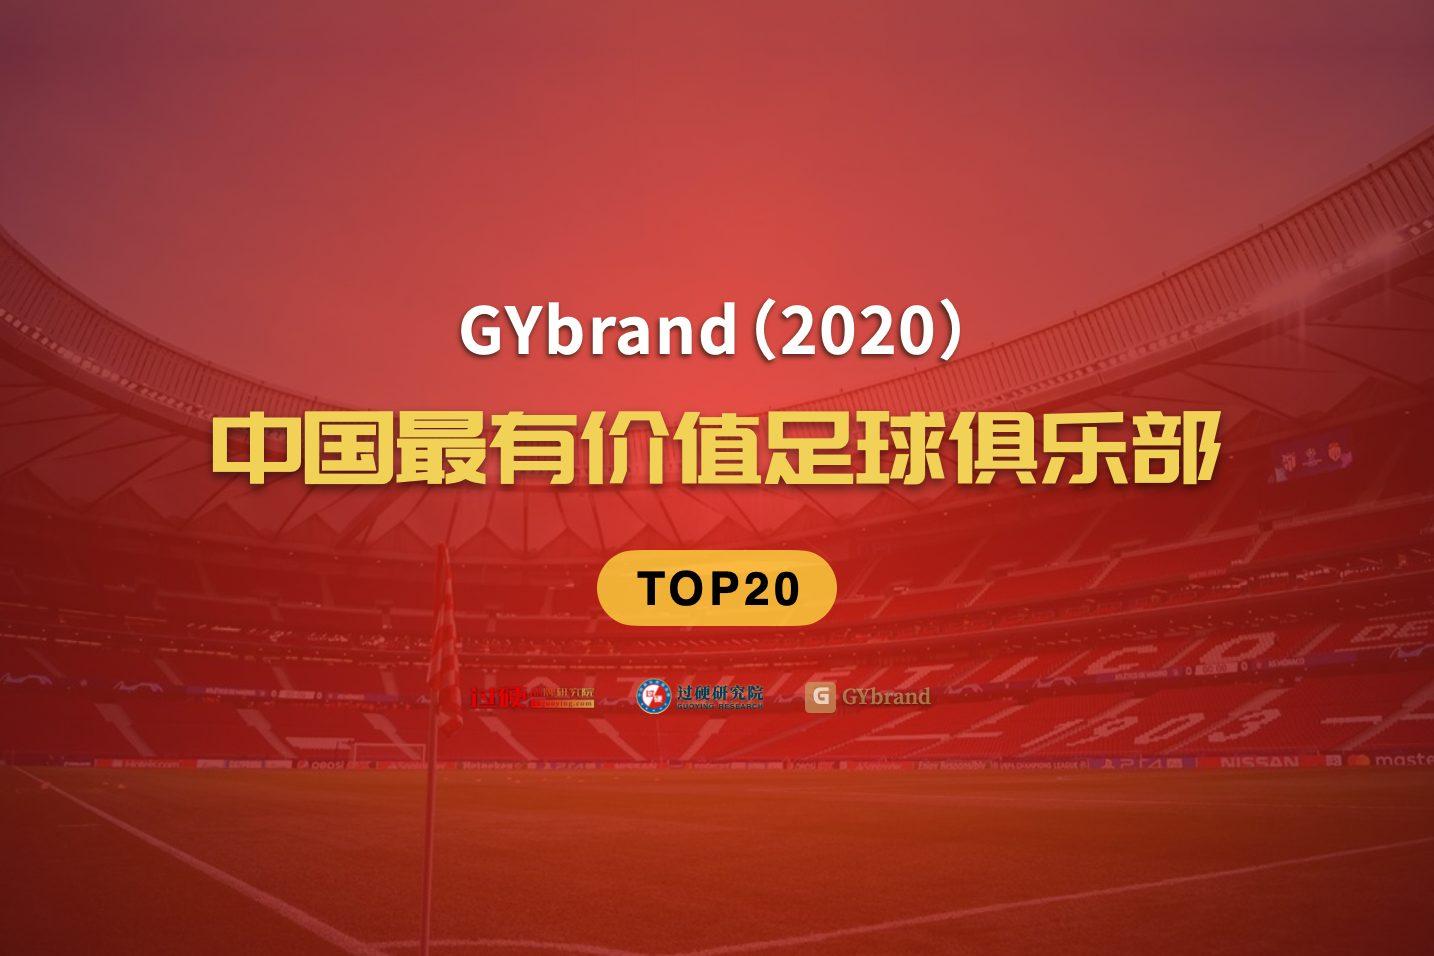 GYbrand发布2020中国最有价值足球队排名 广州恒大重返榜首